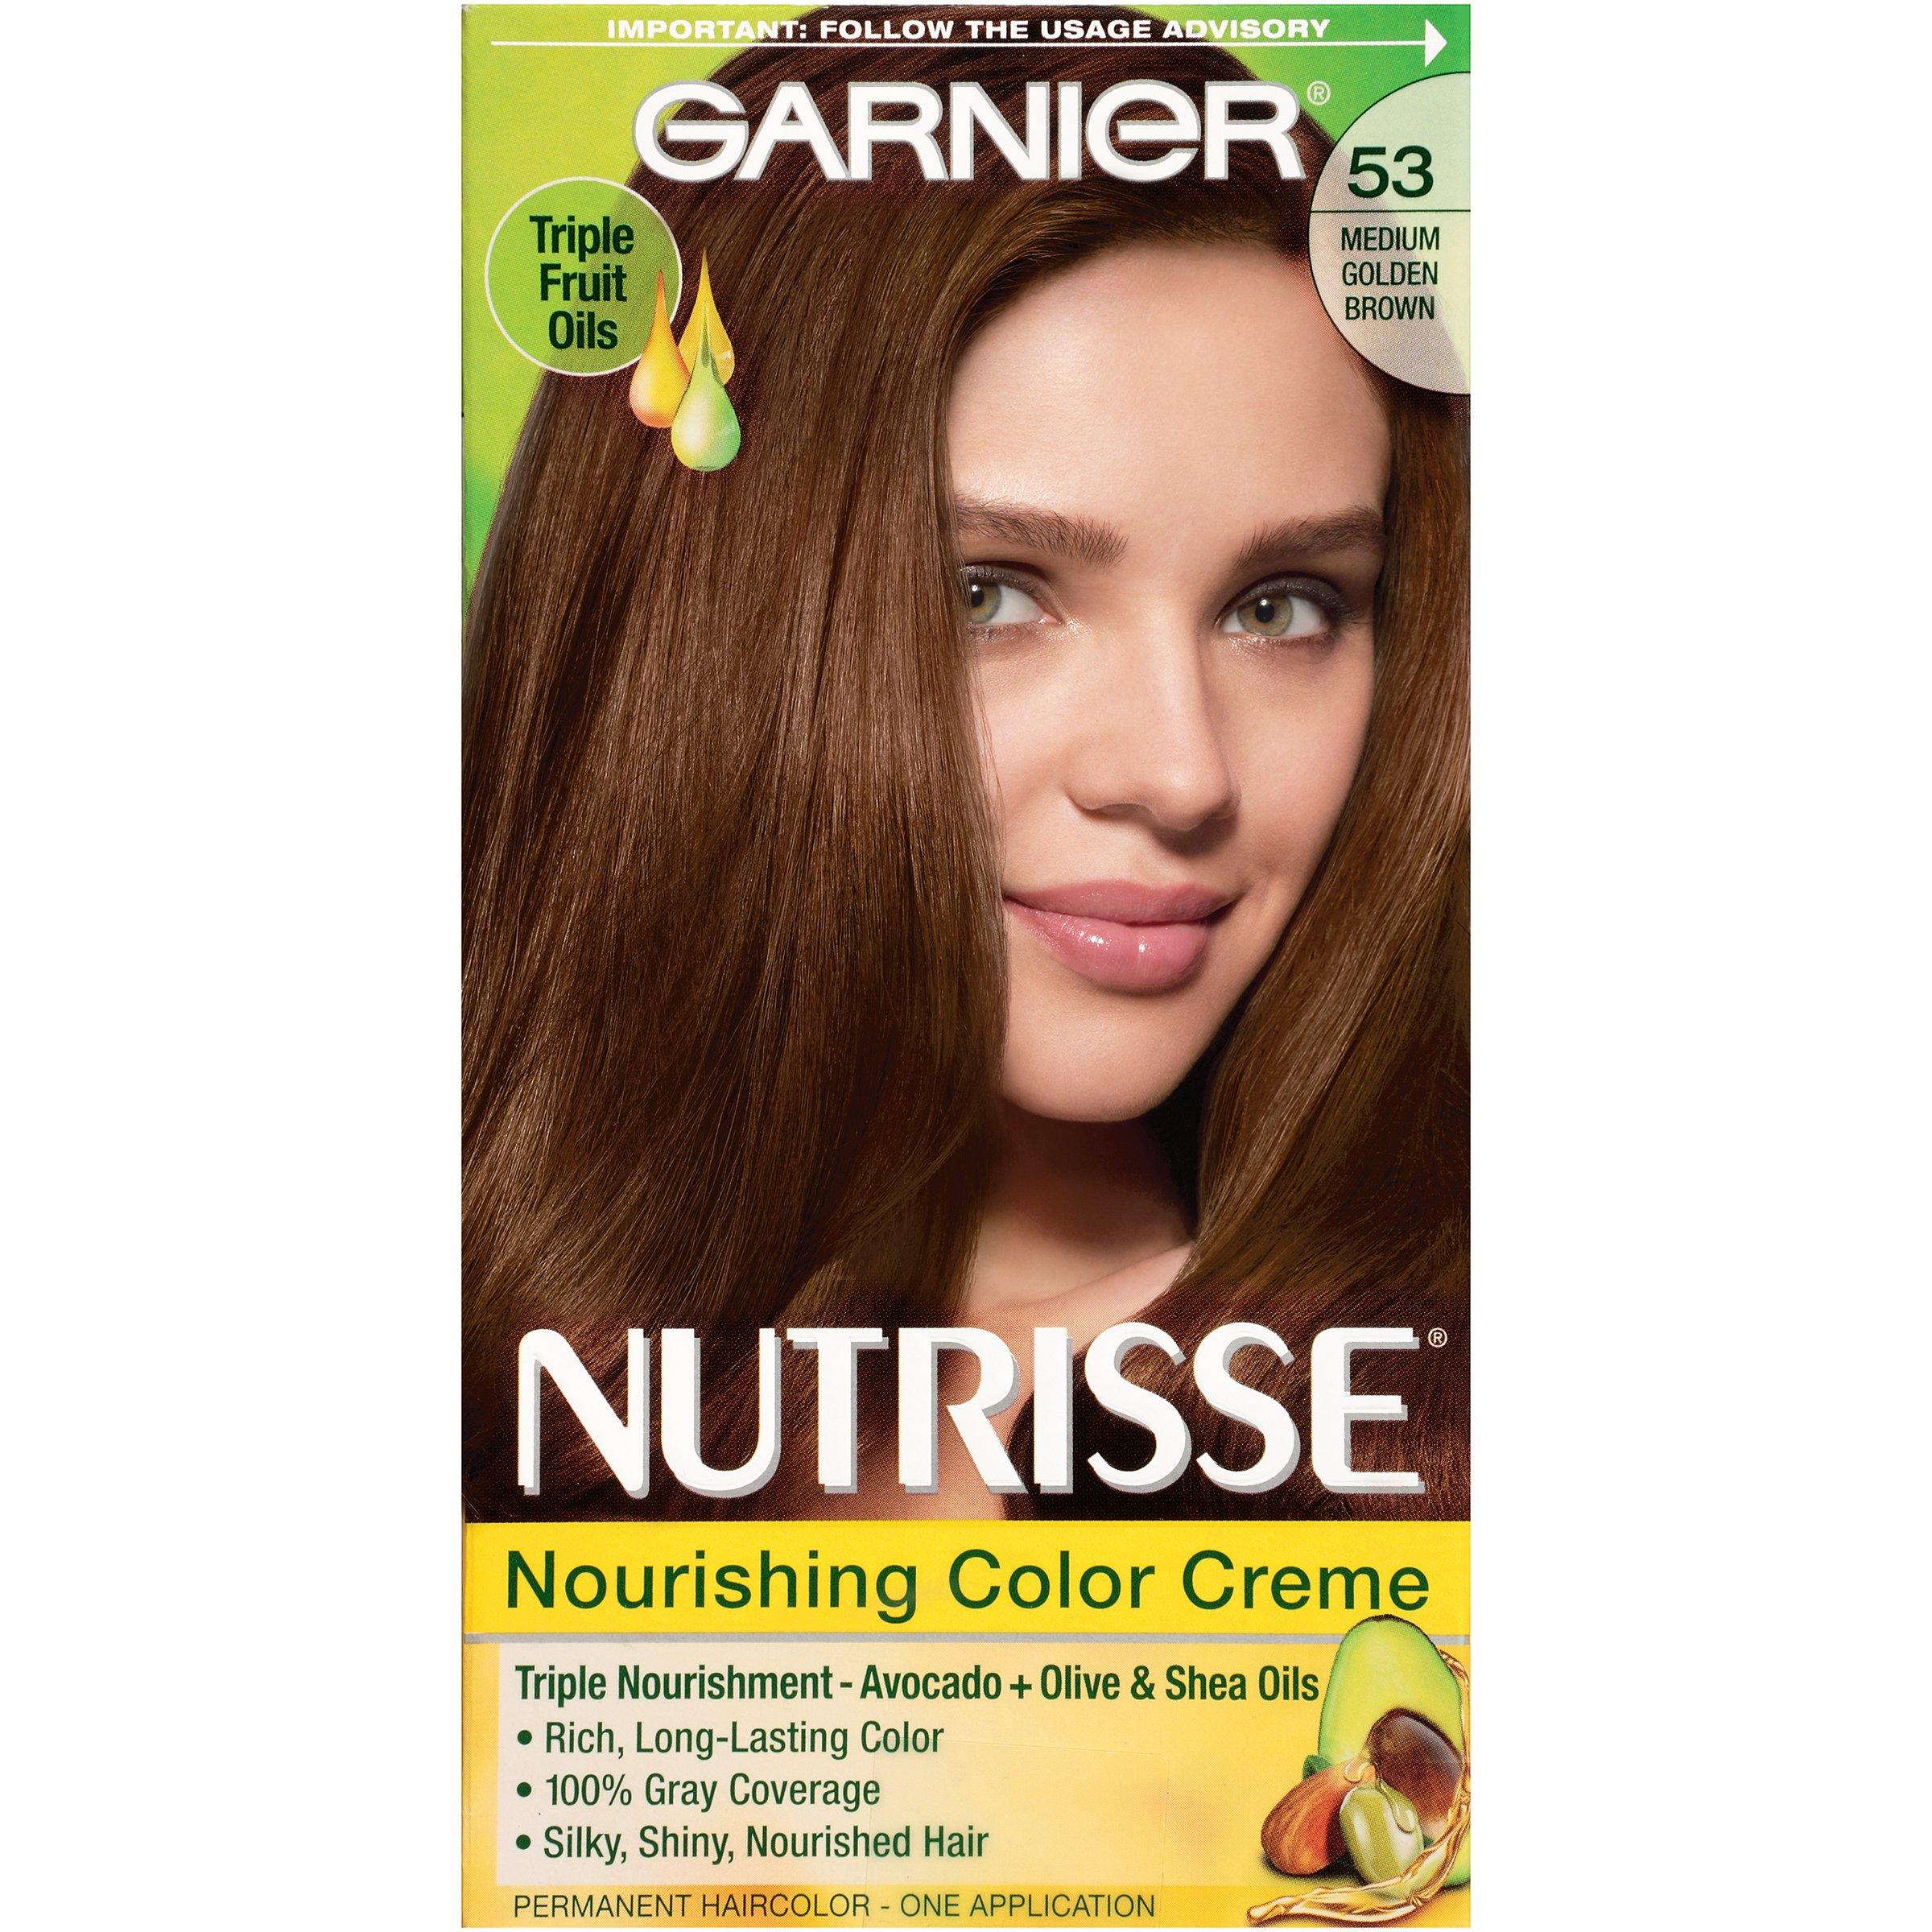 Amazon garnier nutrisse nourishing hair color creme 20 soft garnier nutrisse nourishing hair color creme 53 medium golden brown chestnut packaging nvjuhfo Gallery